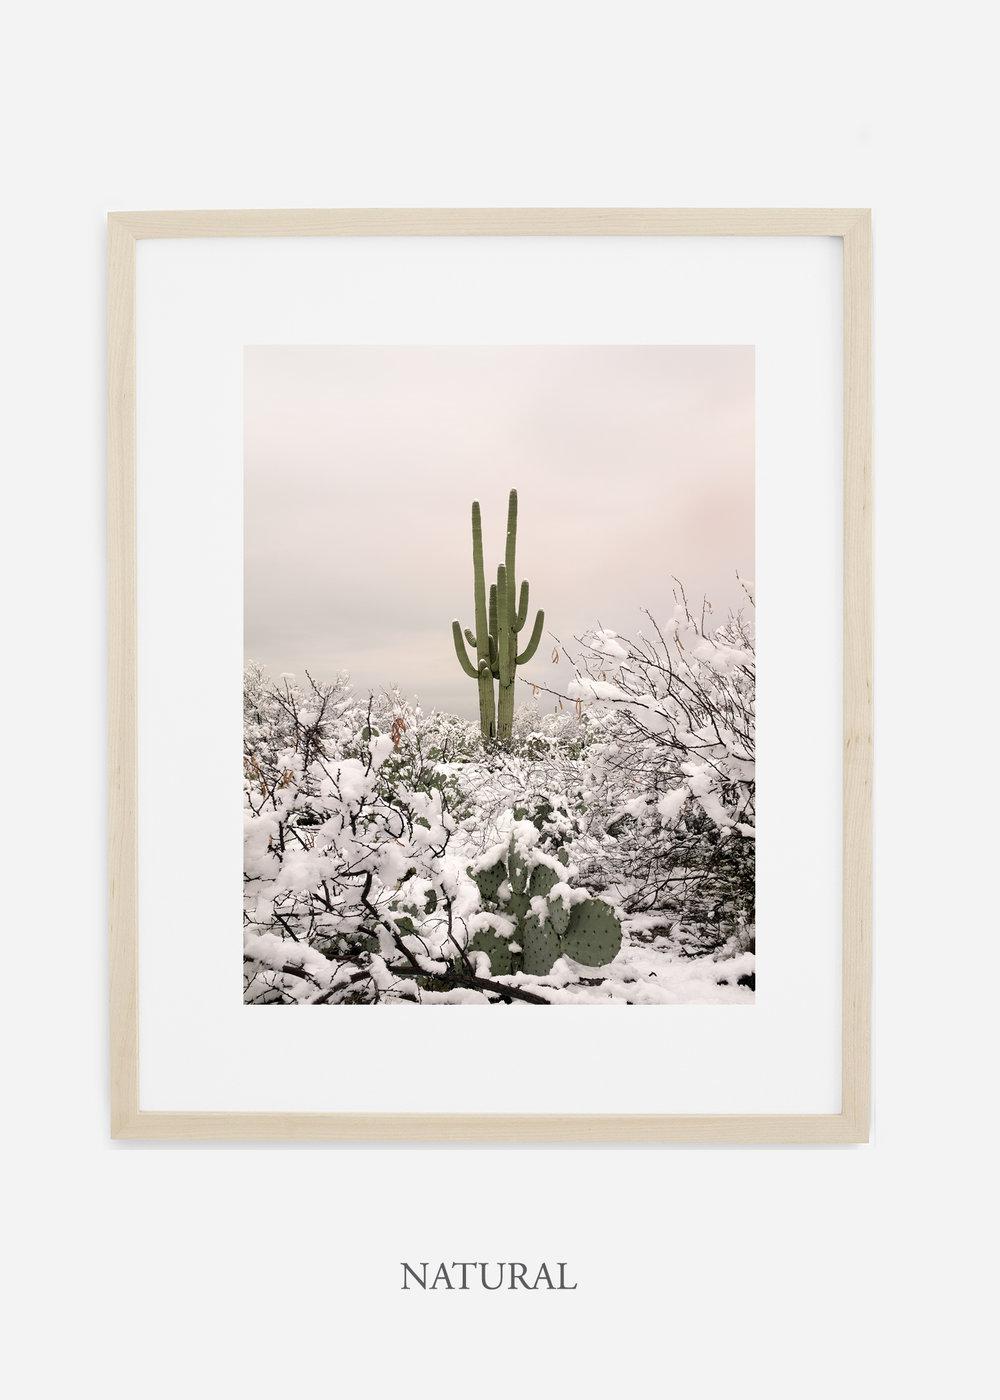 naturalframe-saguaroNo.2-wildercalifornia-art-wallart-cactusprint-homedecor-prints-arizona-botanical-artwork-interiordesign.jpg